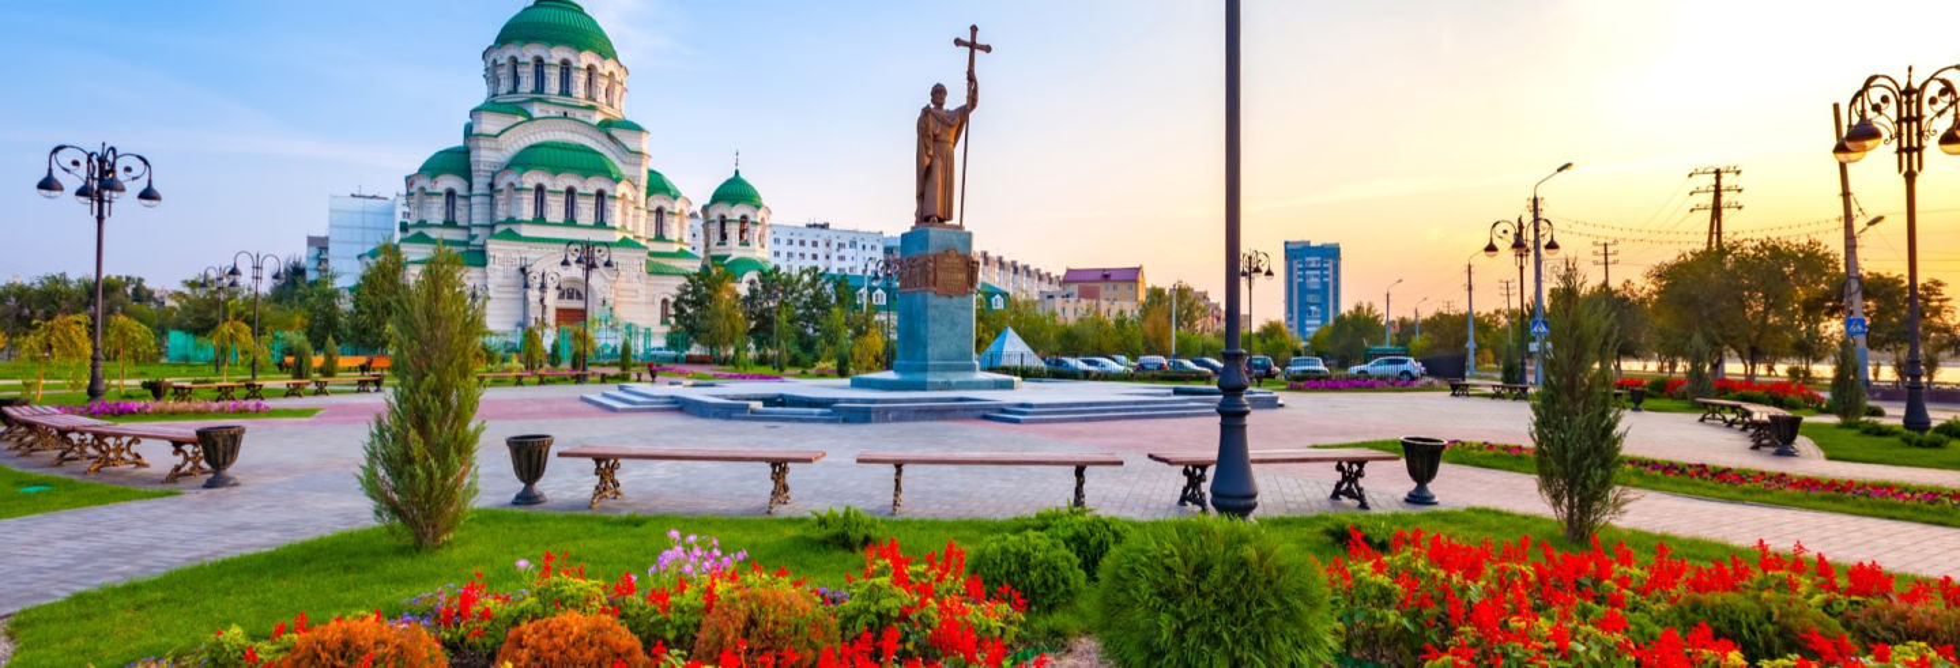 Visita guiada privada por Astracán